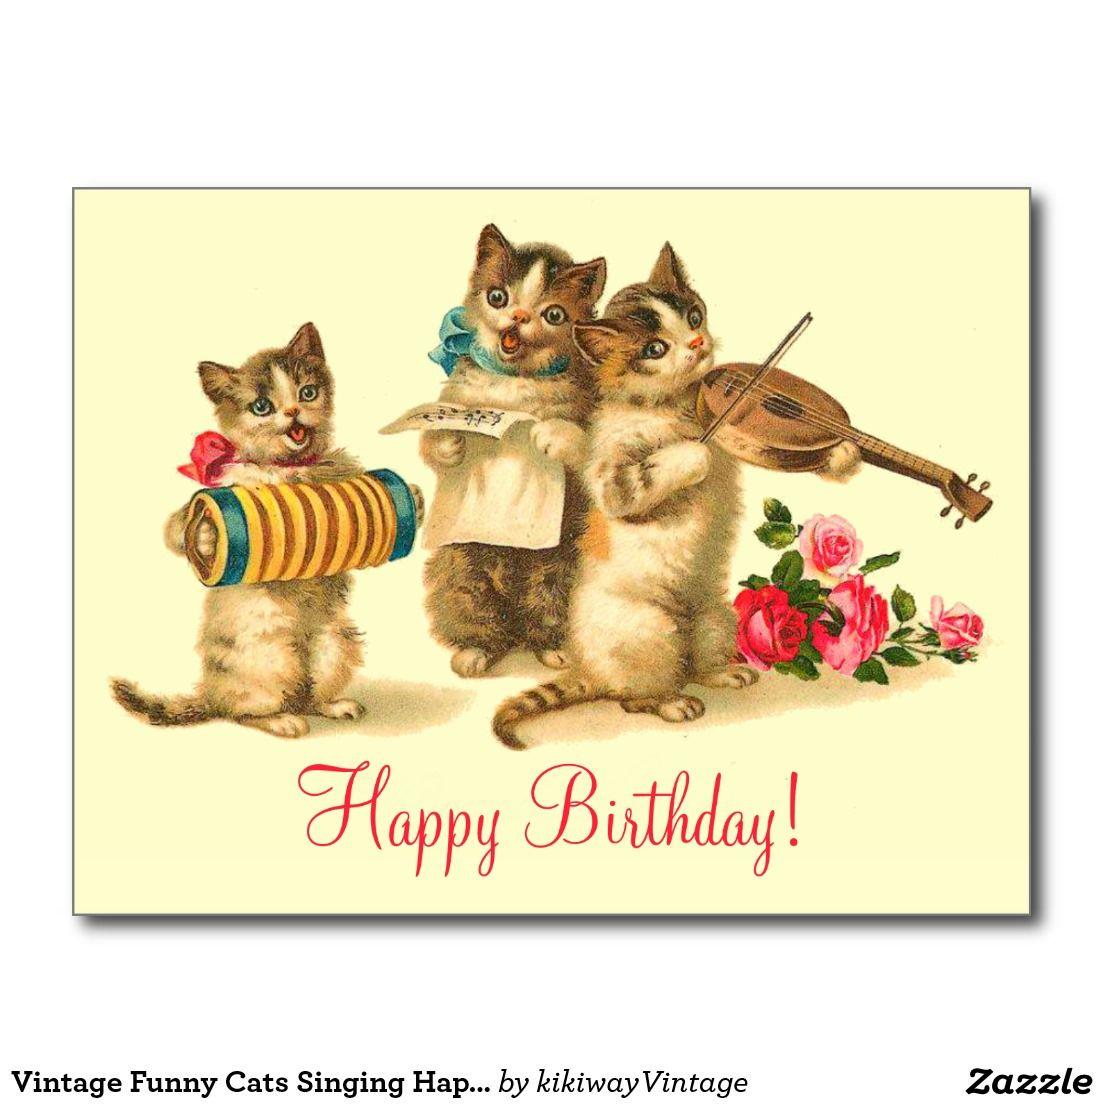 Vintage Funny Cats Singing Happy Birthday Postcard